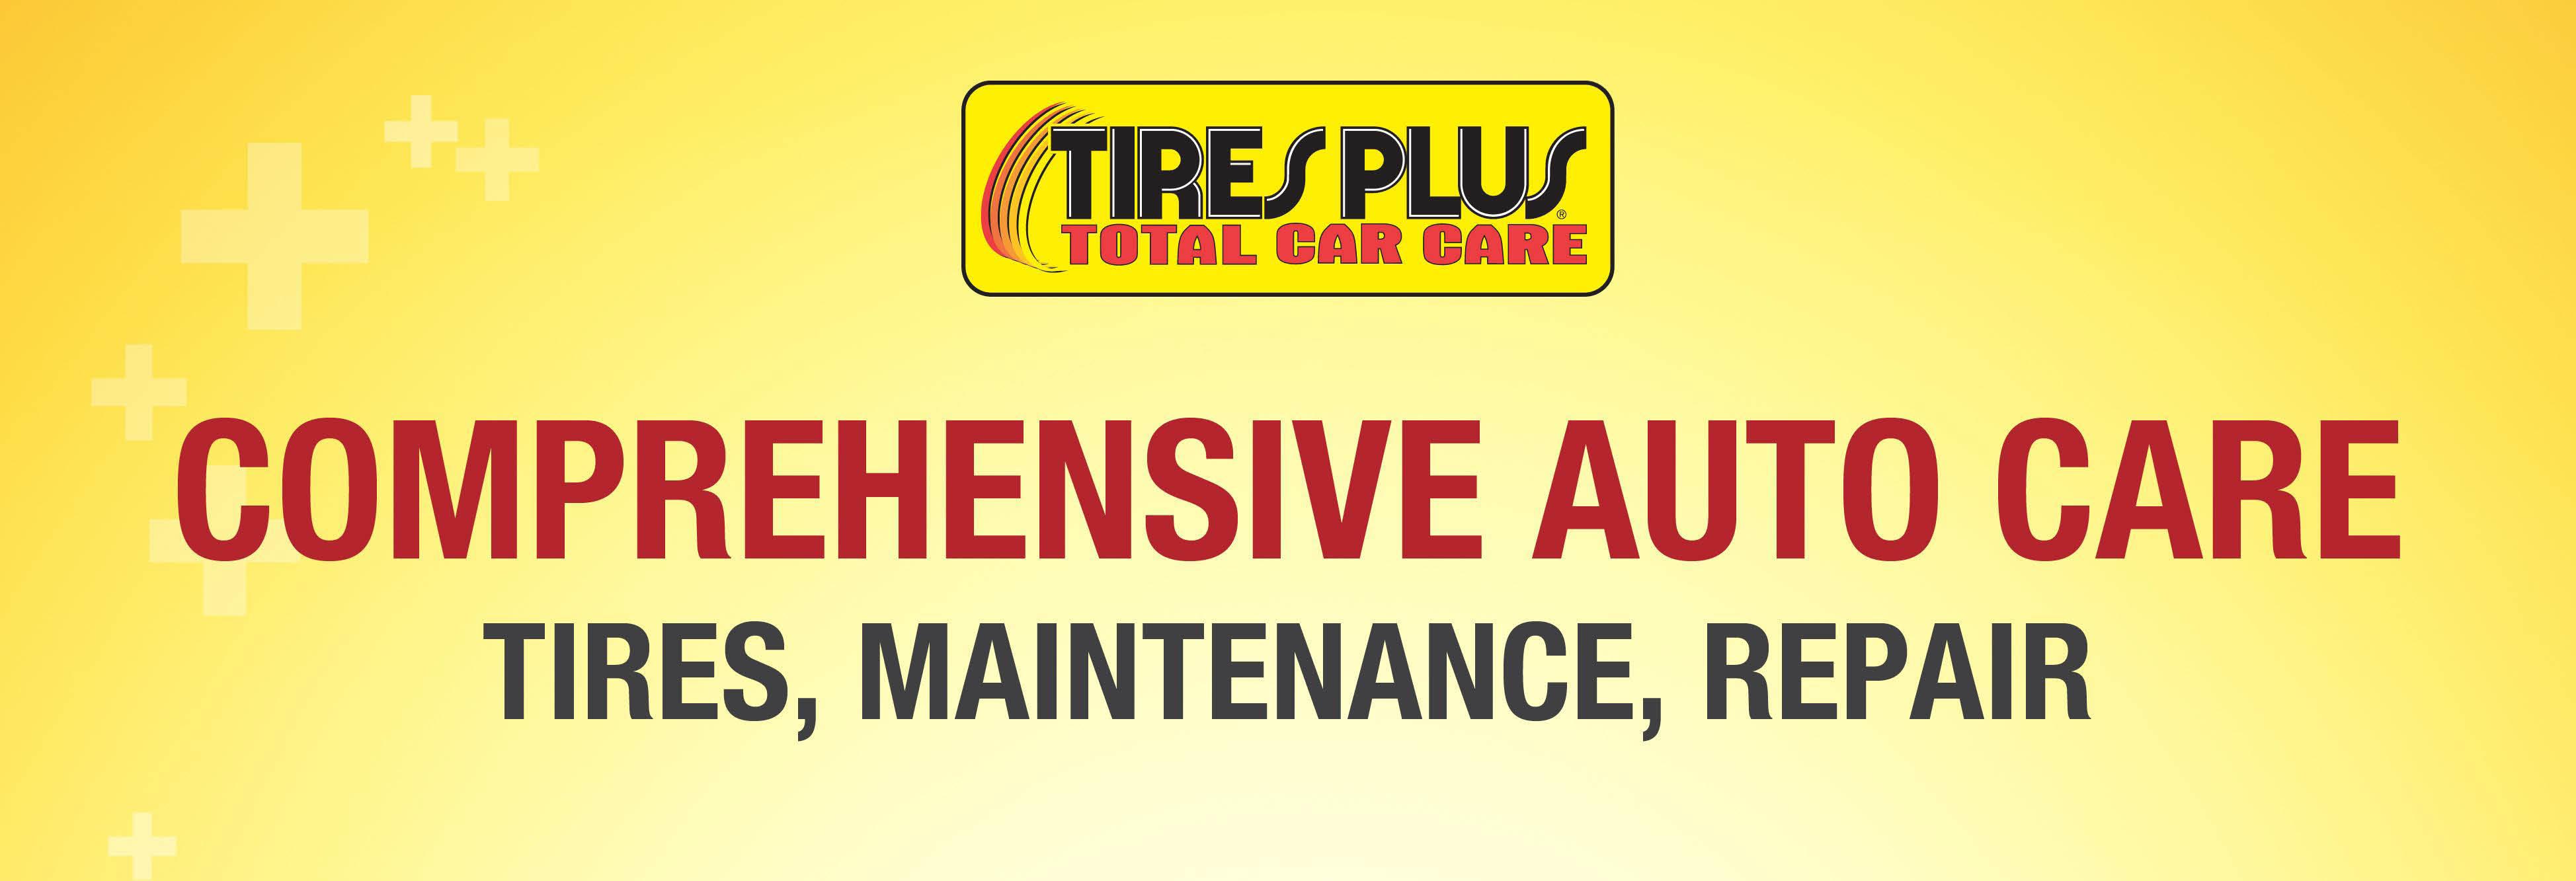 Tires Plus near me Tallahassee Florida Tires Plus Oil change coupon